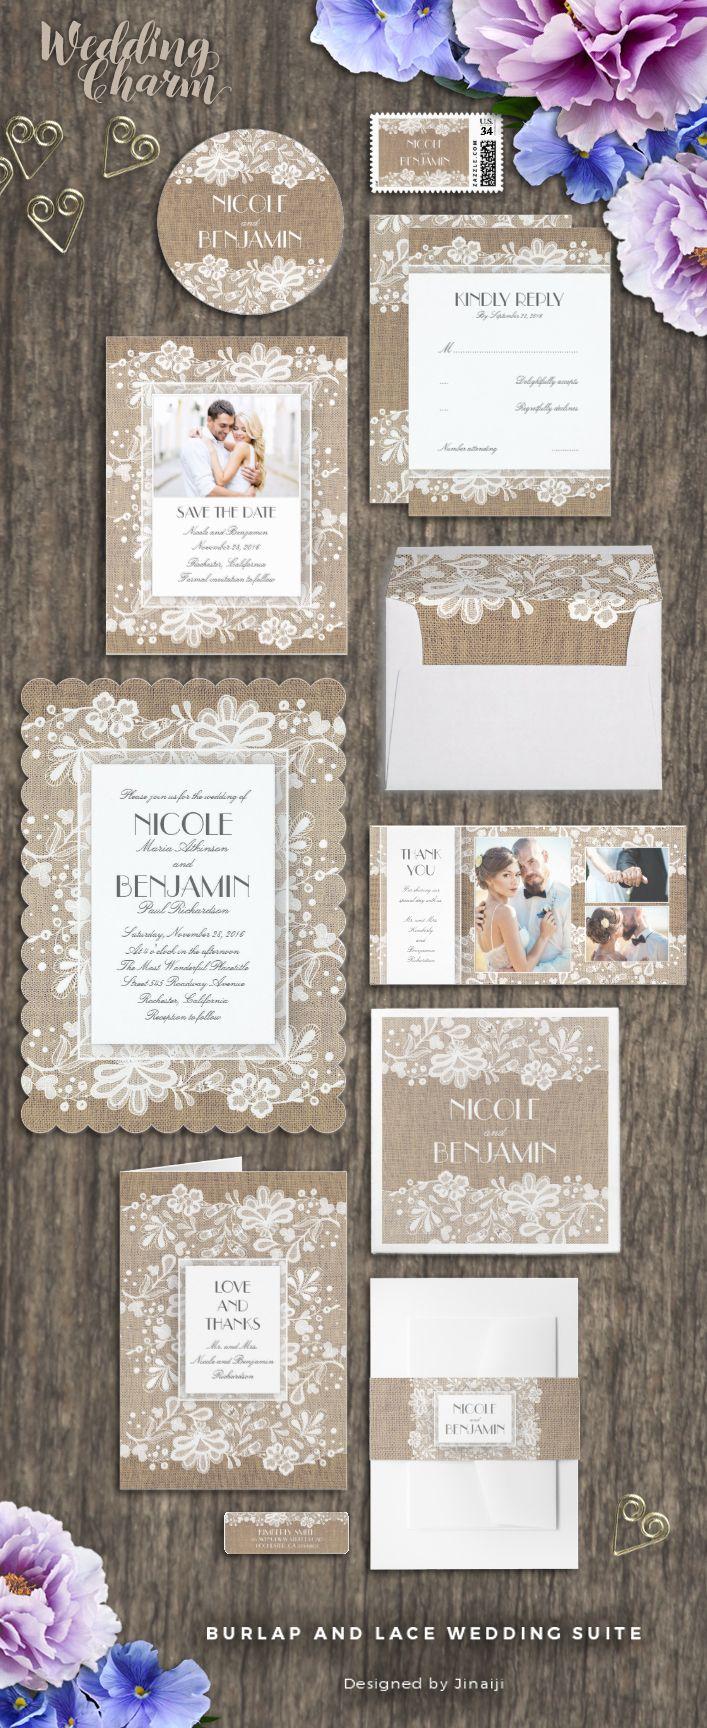 monogram wedding envelope seals sticker%0A Rustic burlap and vintage floral lace elegant Wedding Invitation Collection